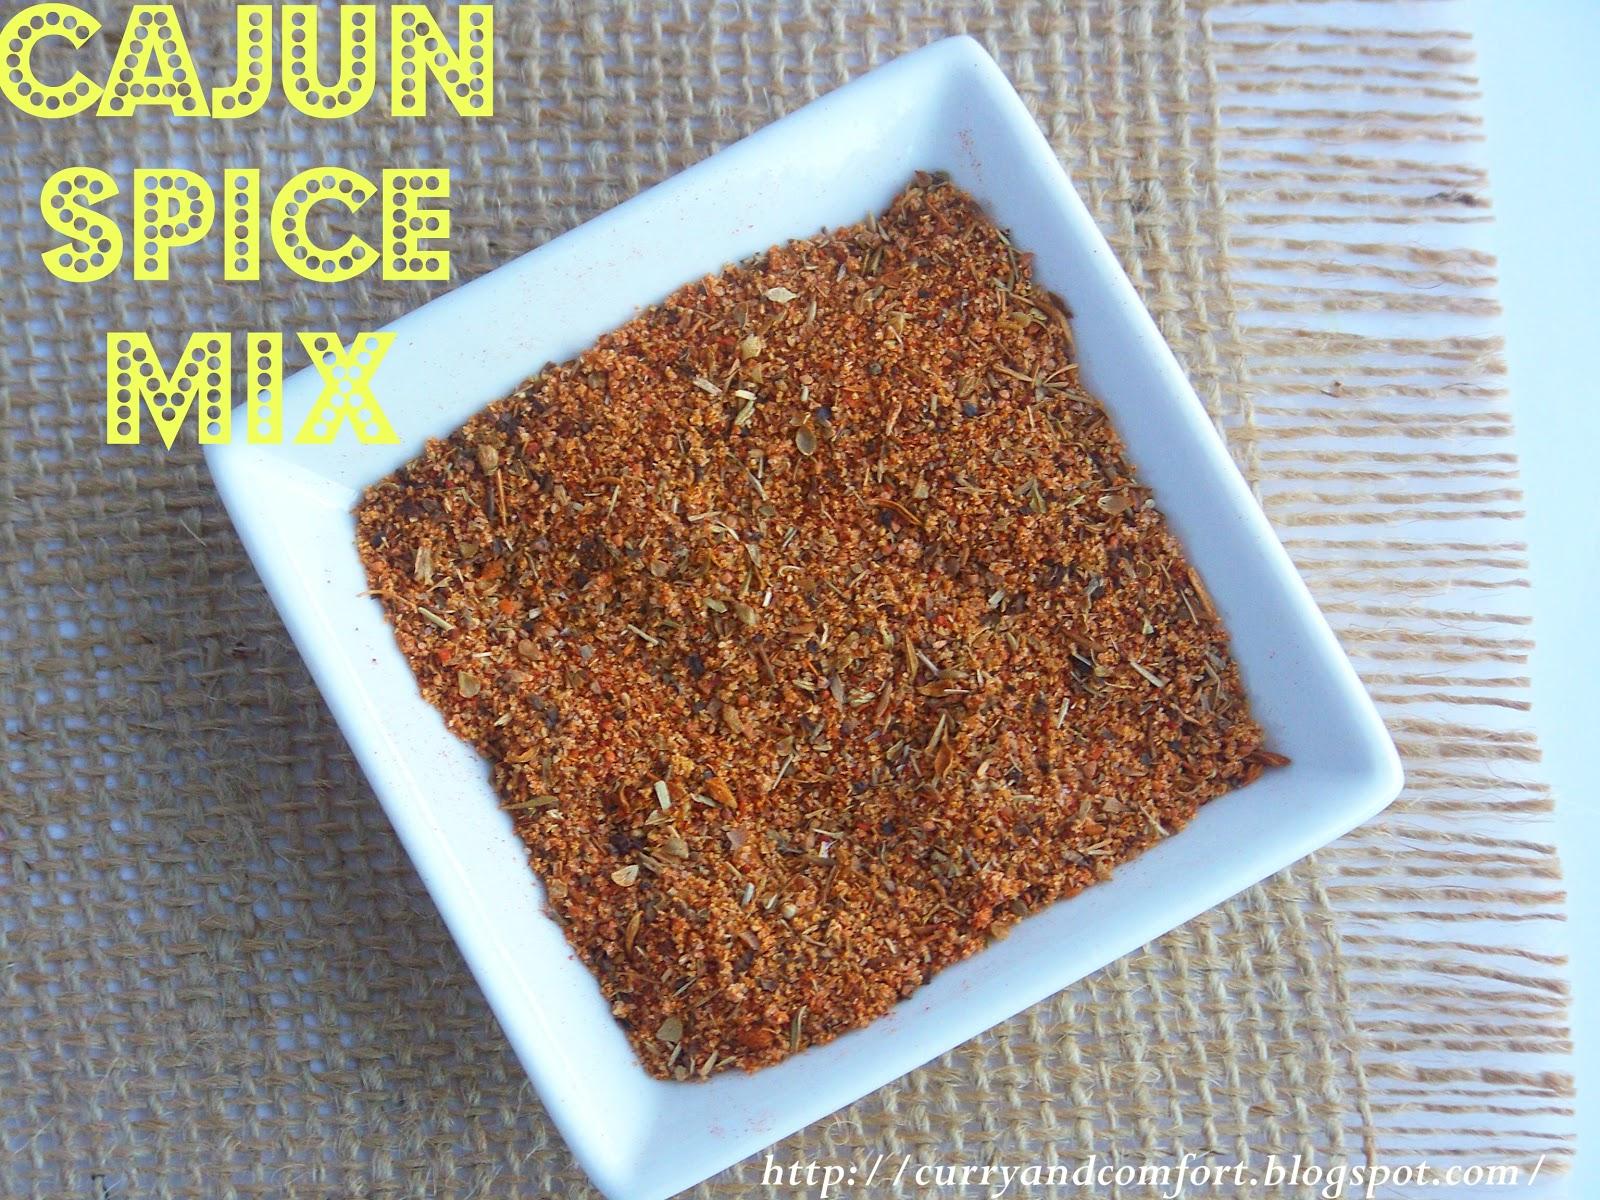 Cajun+spice+mix.jpg